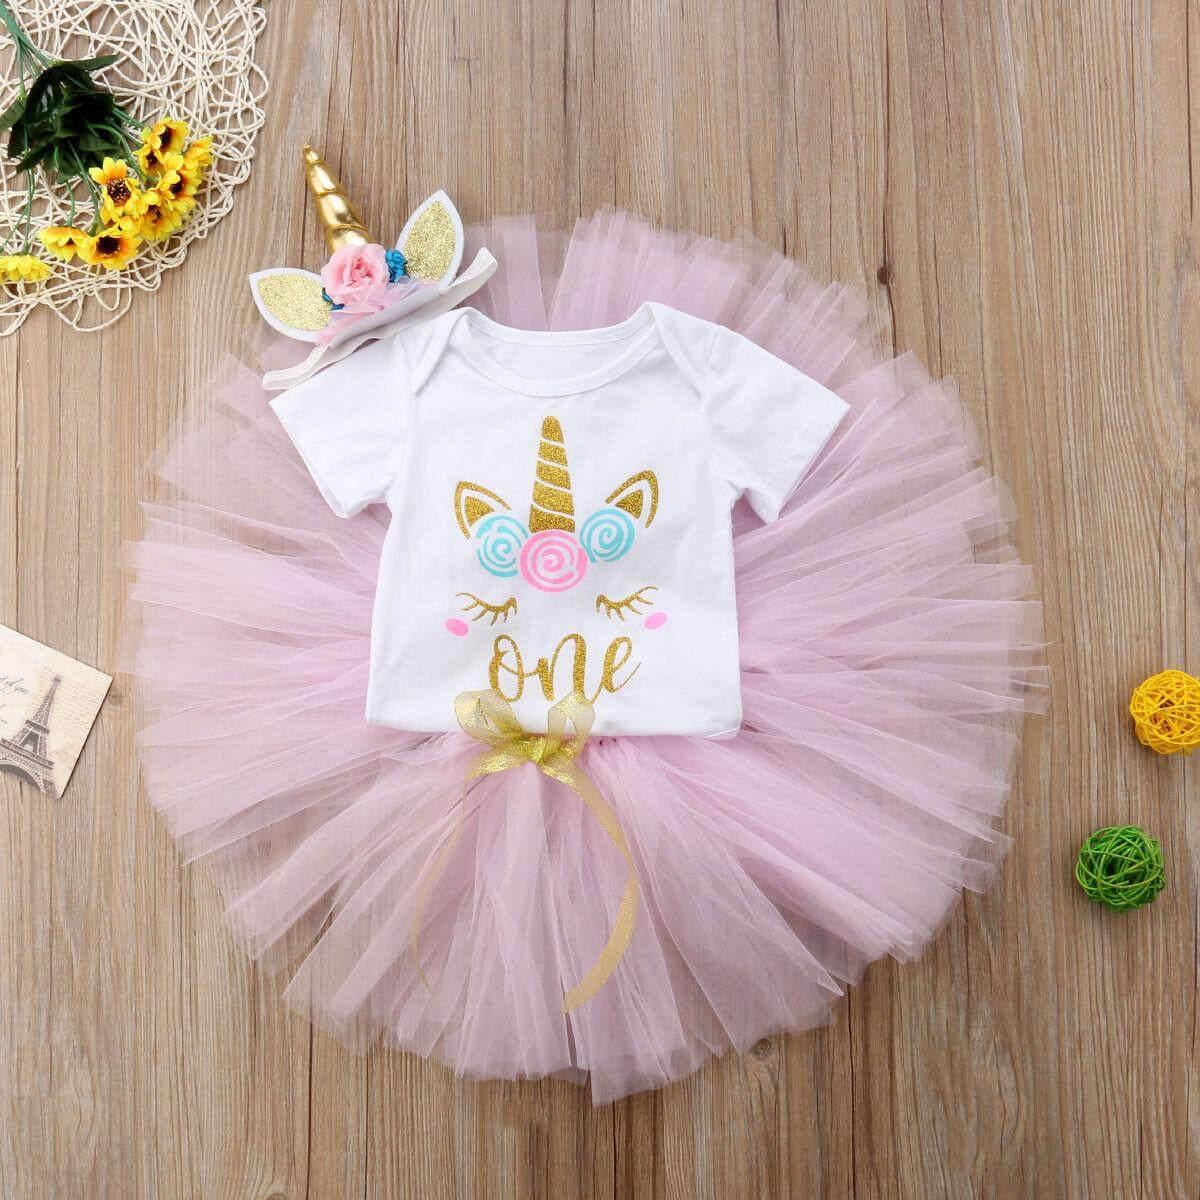 Review Unicorn Bayi Perempuan Baru Lahir Atasan Katun Jumpsuit Rok